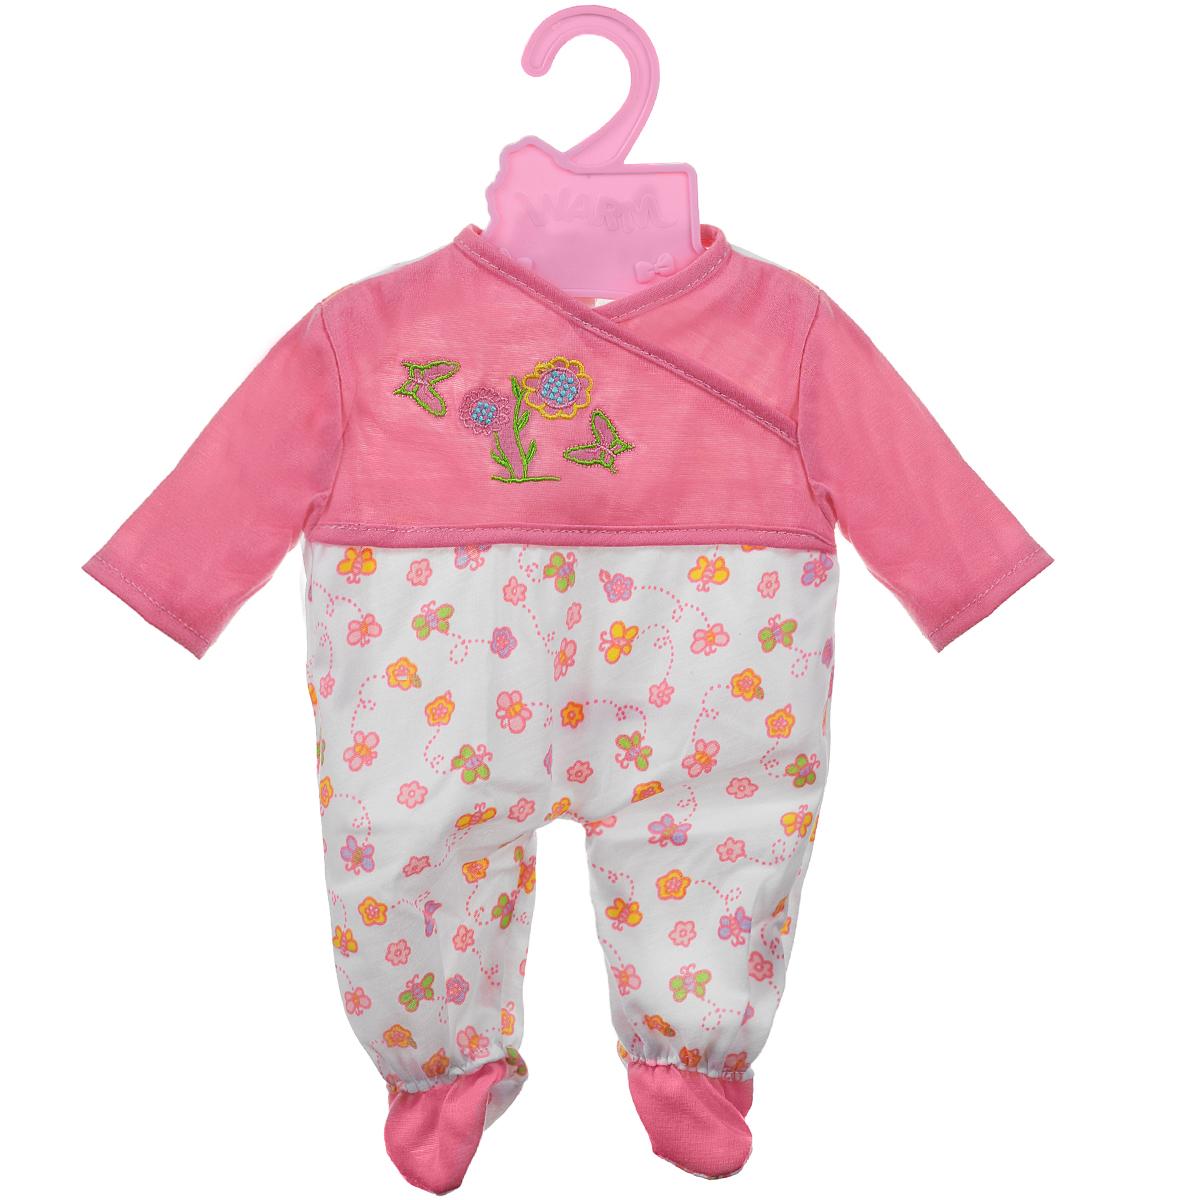 Одежда для куклы Mary Poppins Комбинезон, цвет: розовый, белый mary poppins одежда для куклы 42 см боди mary poppins в ассортименте